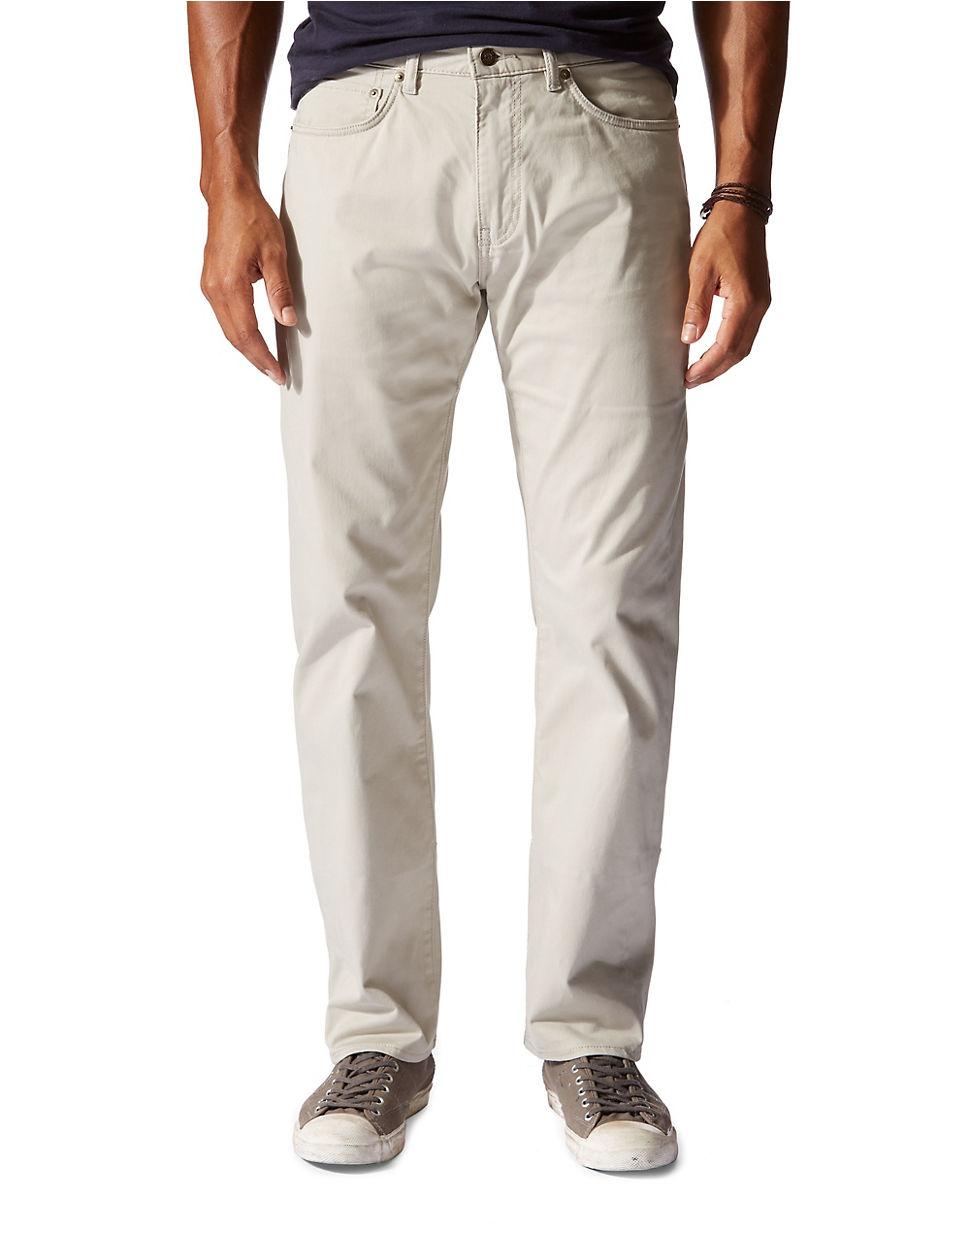 Dockers Jean Cut Straight Fit Pants In Brown For Men Lyst